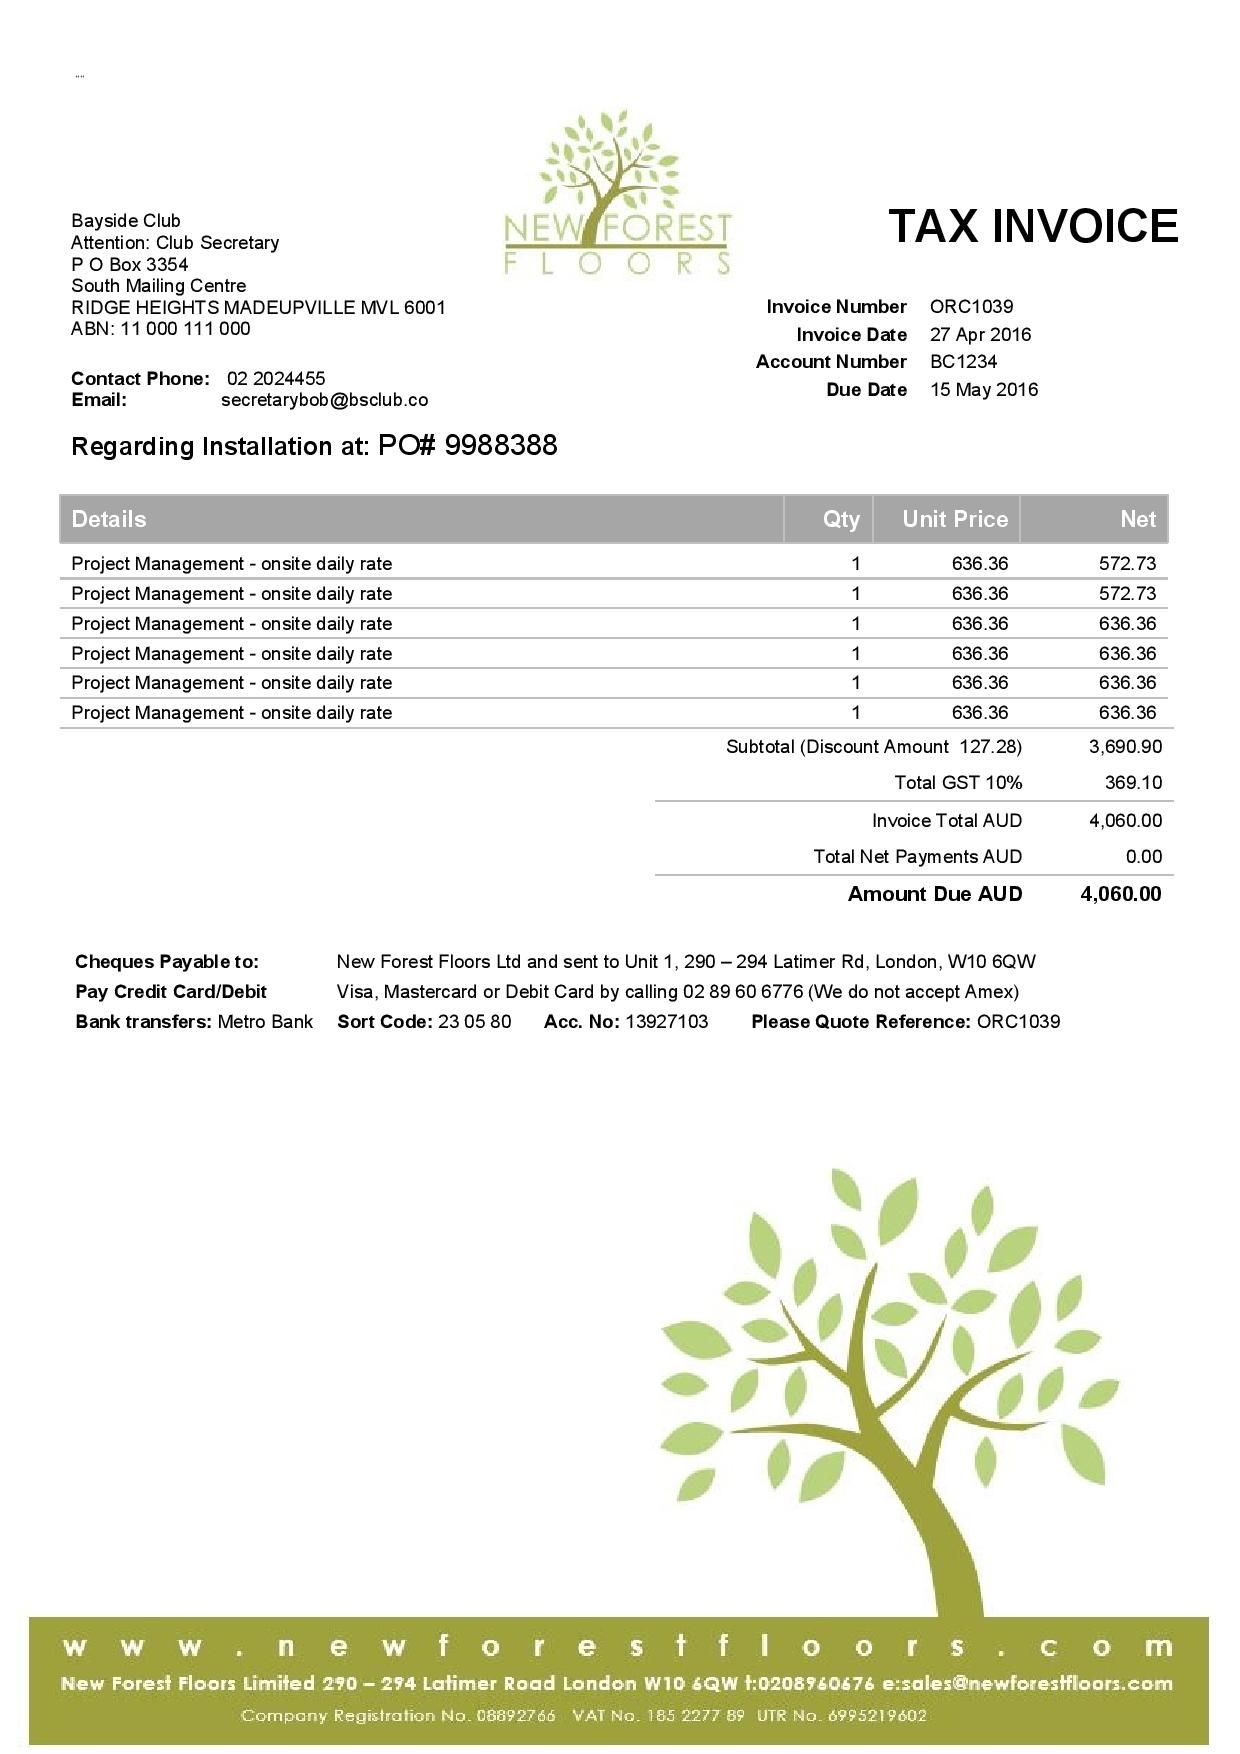 xero customised invoice | xero customized templates | pinterest, Invoice templates